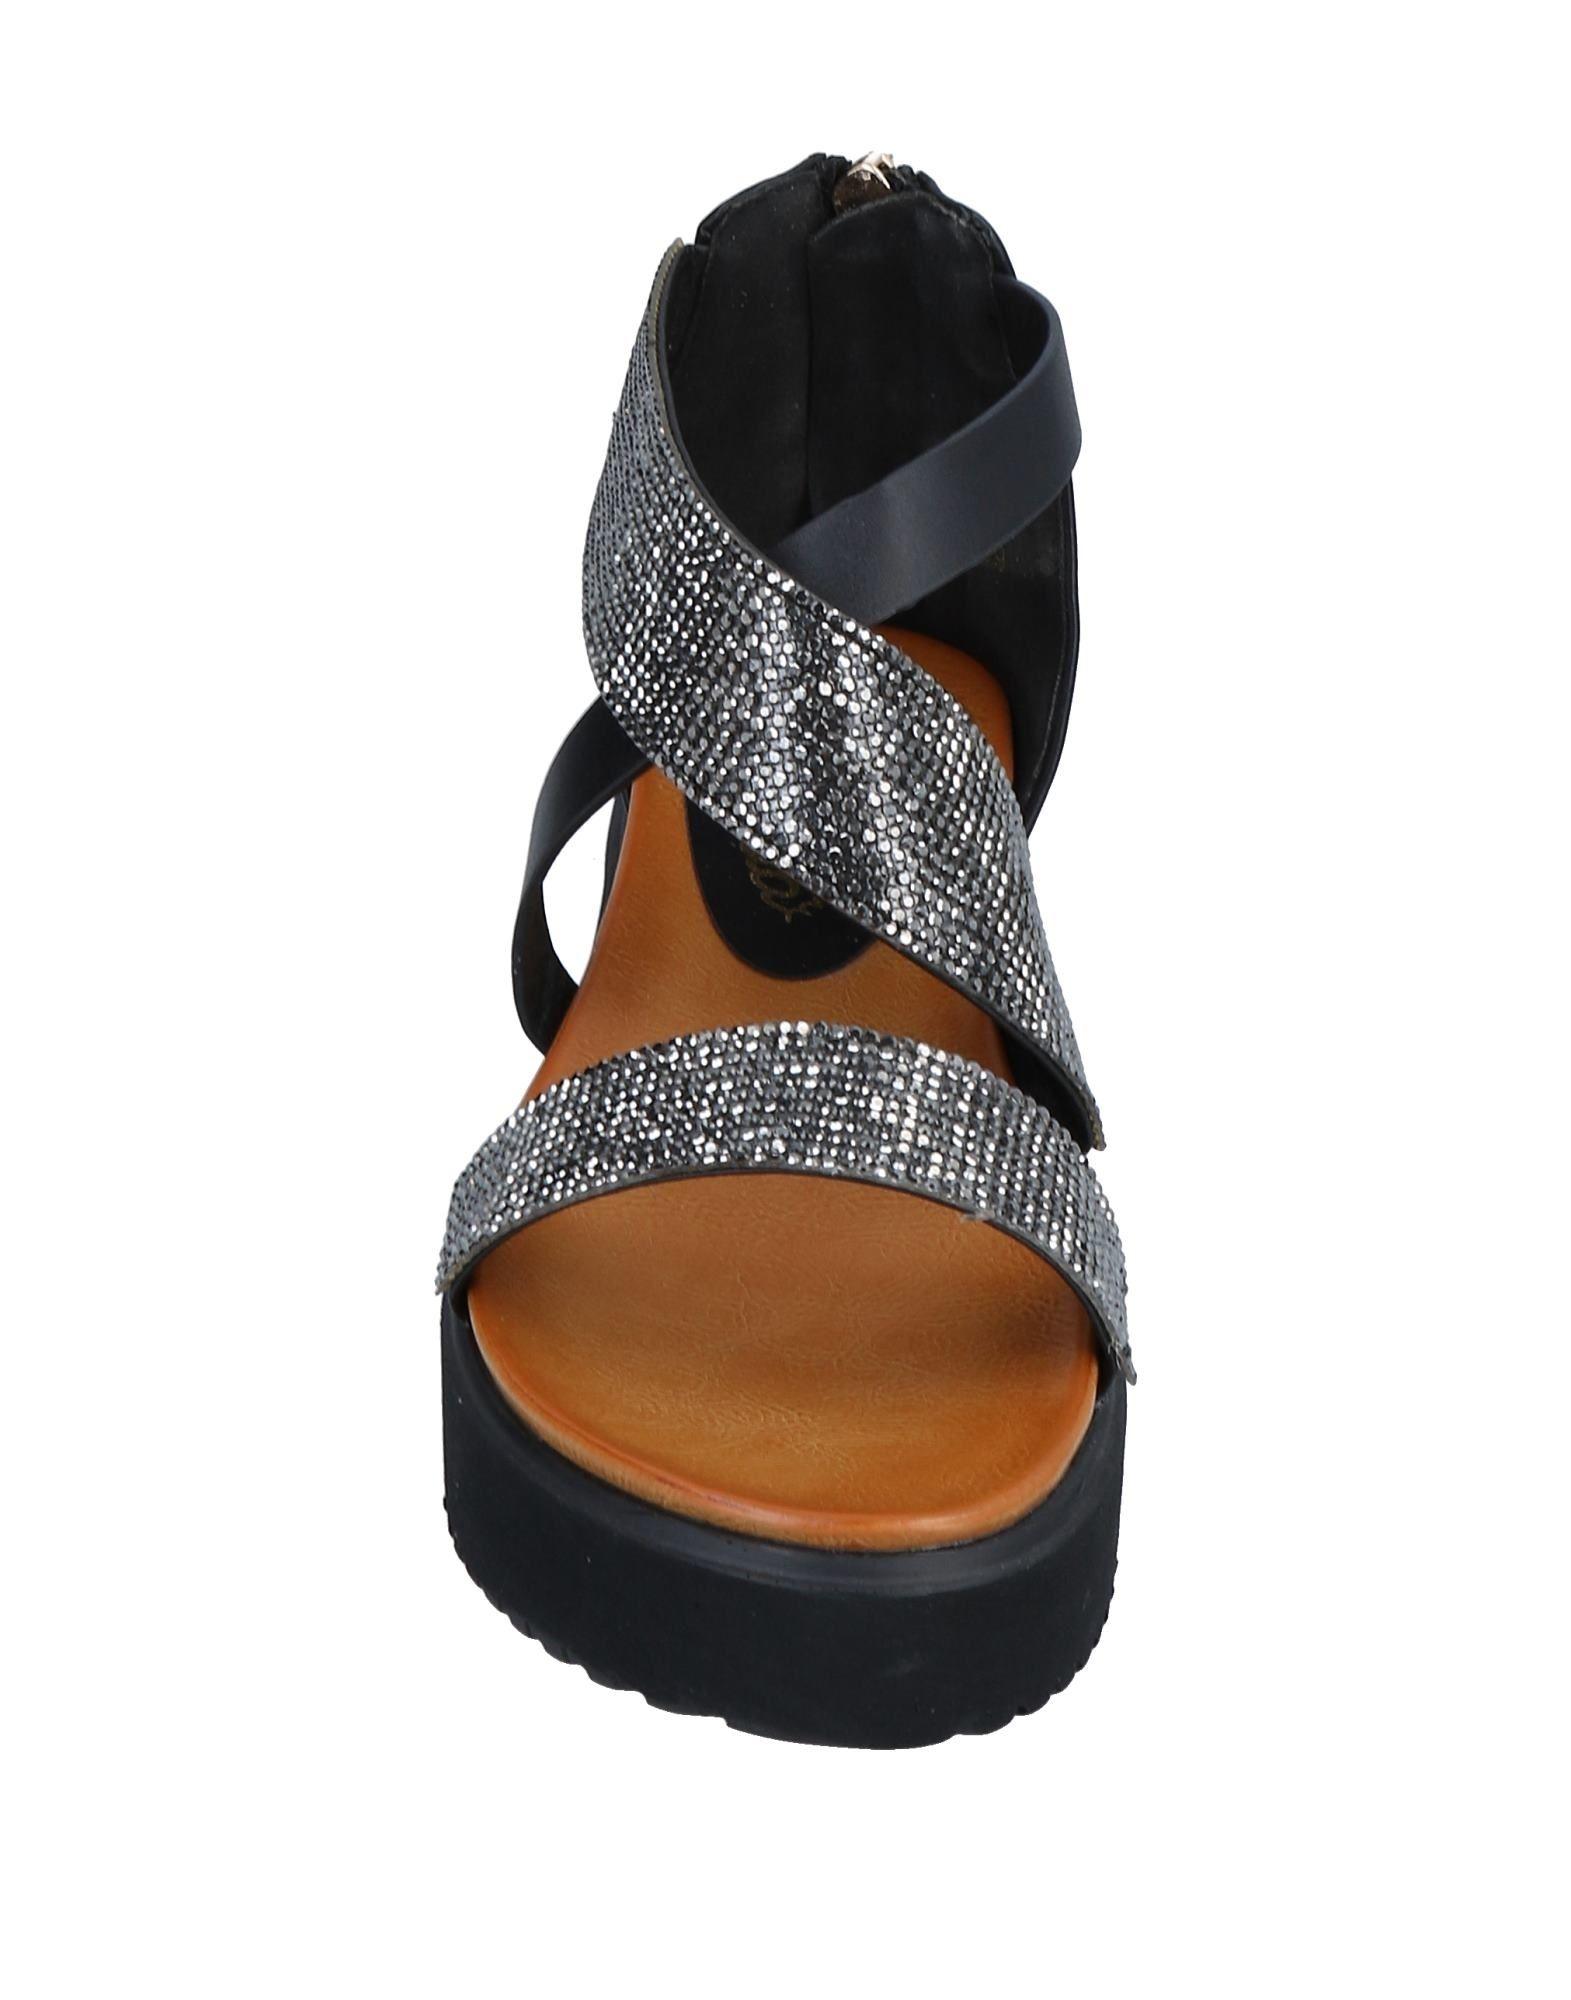 tua par braccialini braccialini braccialini sandales - femmes tua par braccialini sandales en ligne sur canada - 11562143ih 819d54